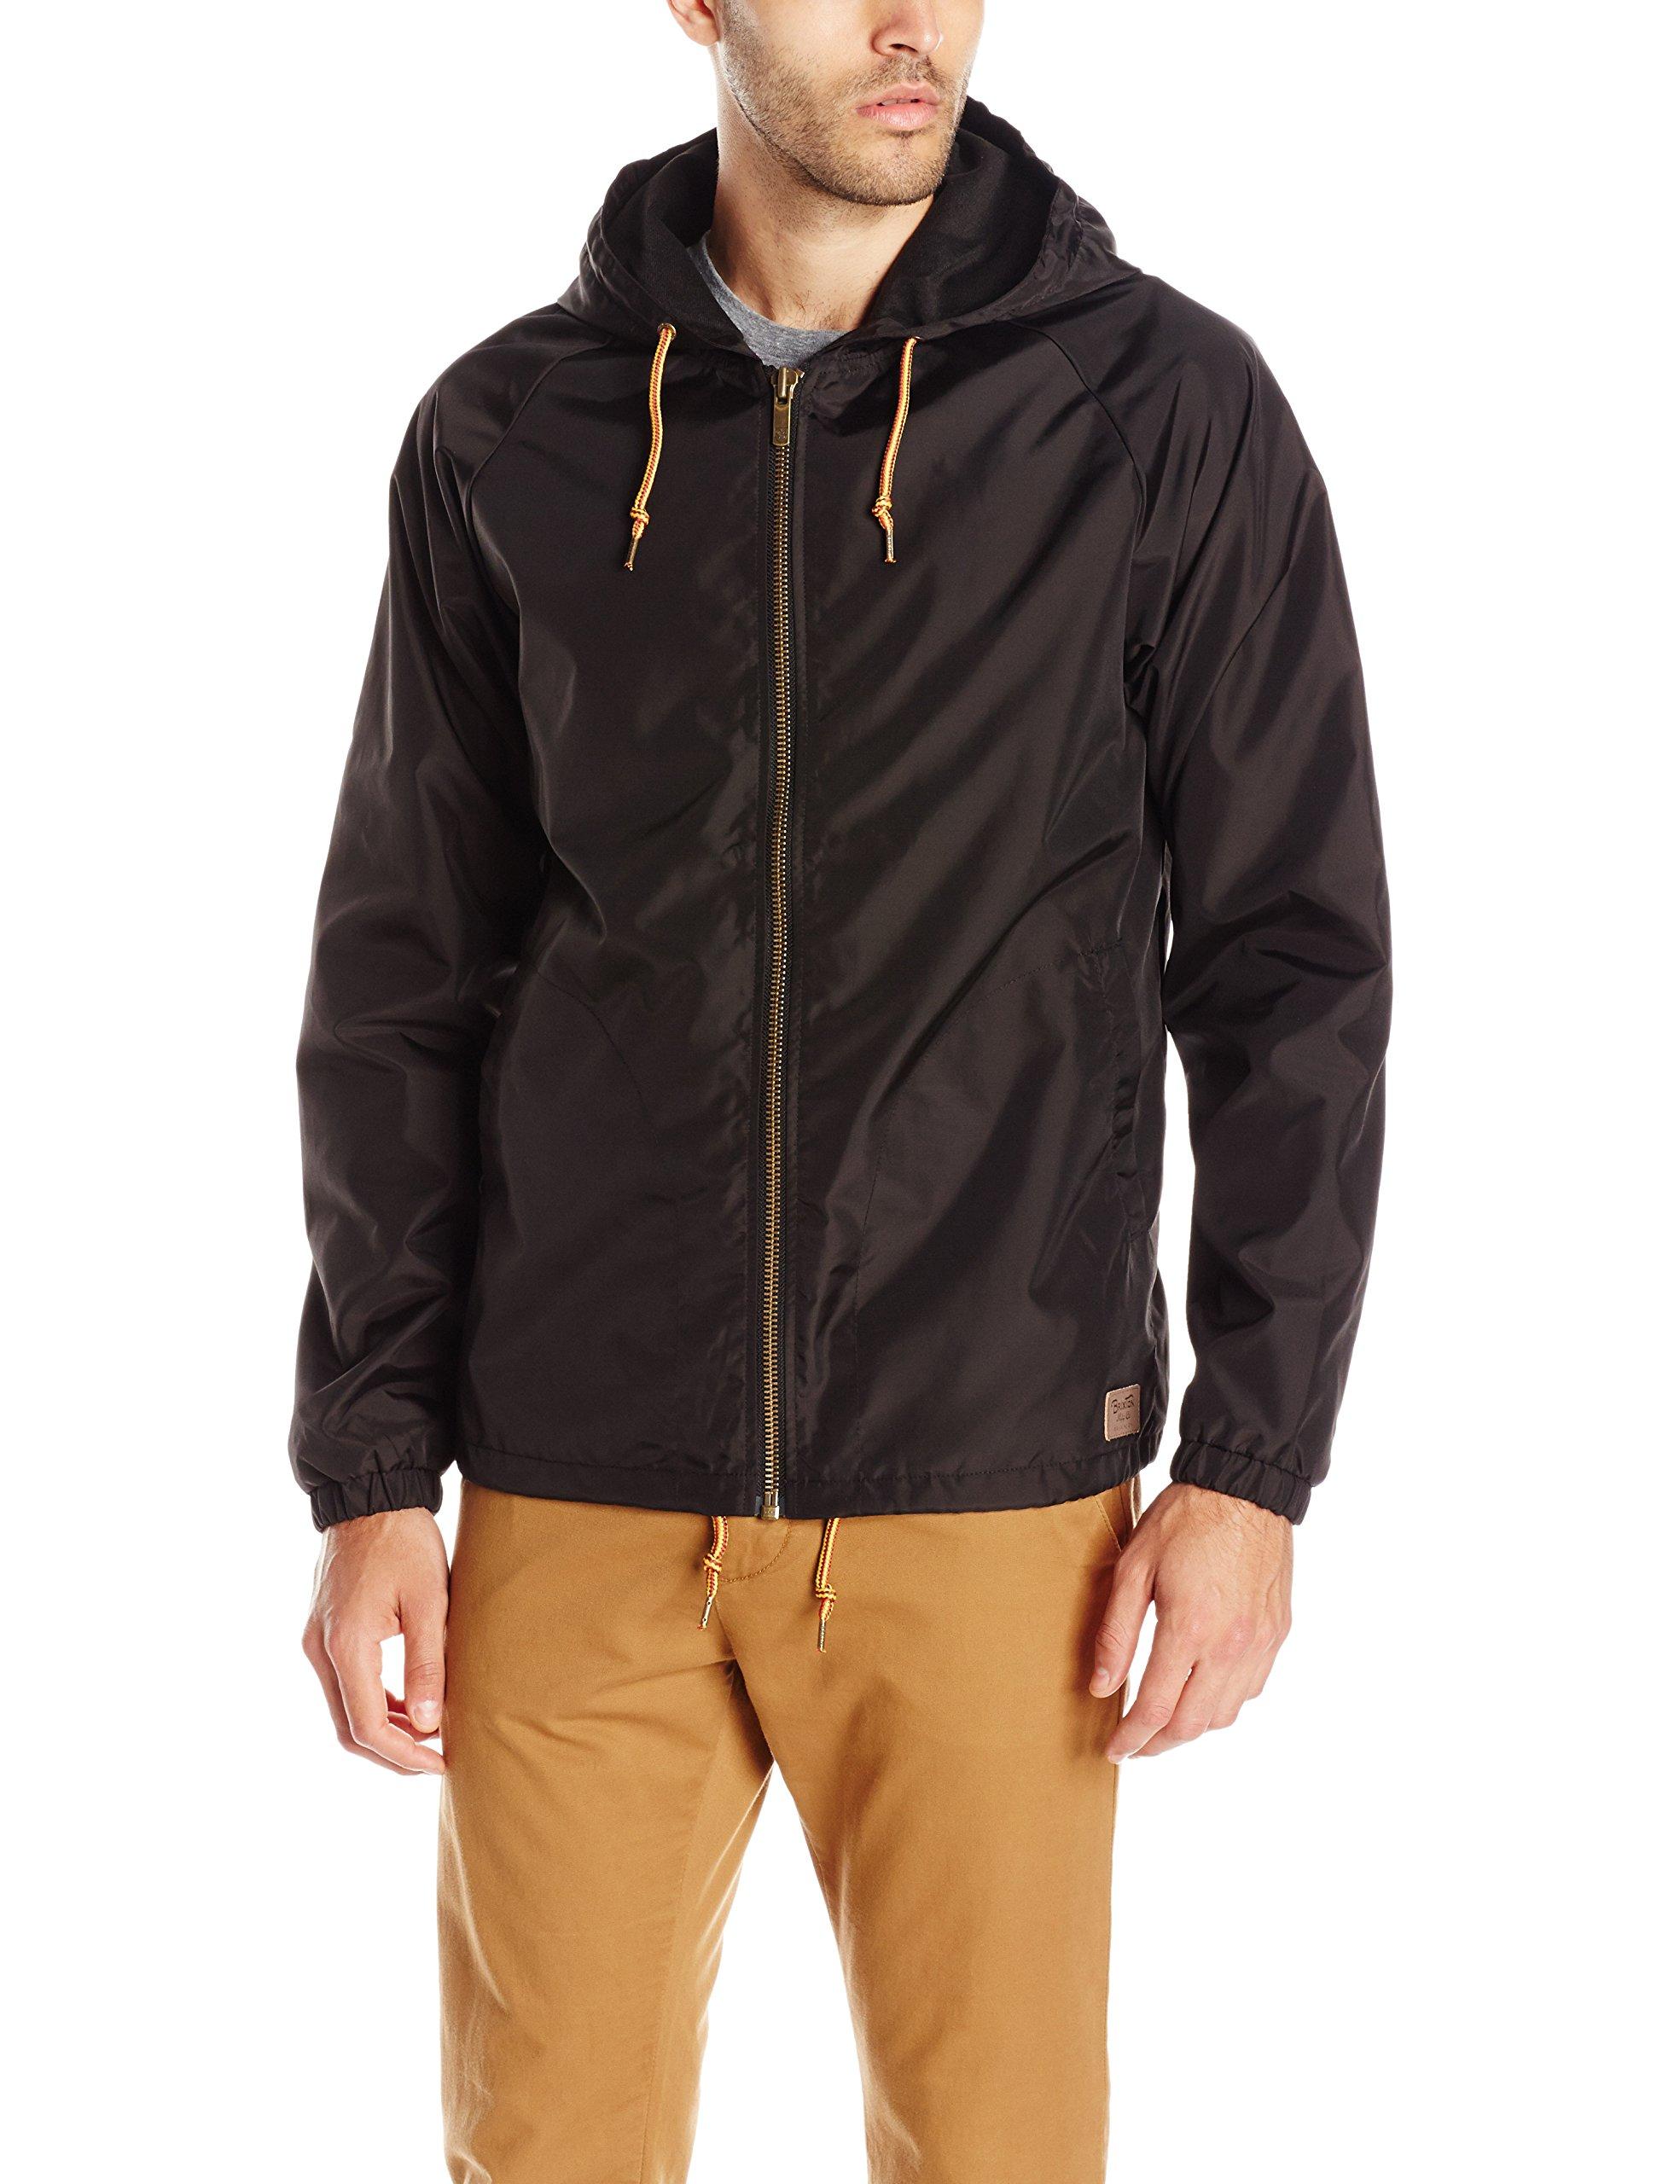 Brixton Men's Claxton Jacket, Black, Large